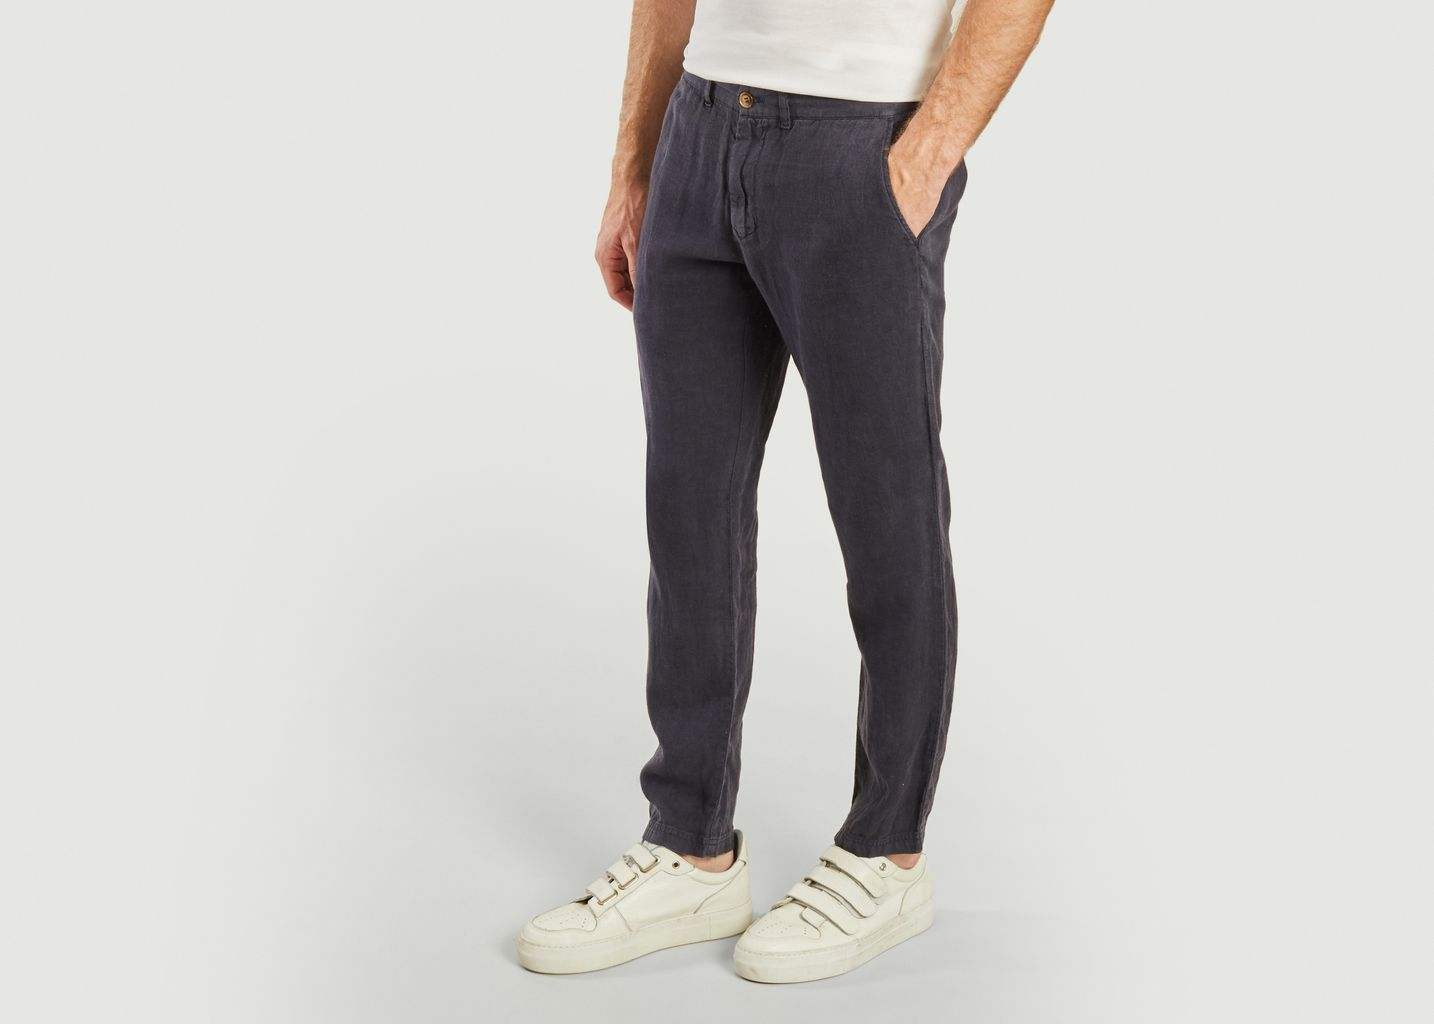 Pantalon chino en lin - 1789 Cala